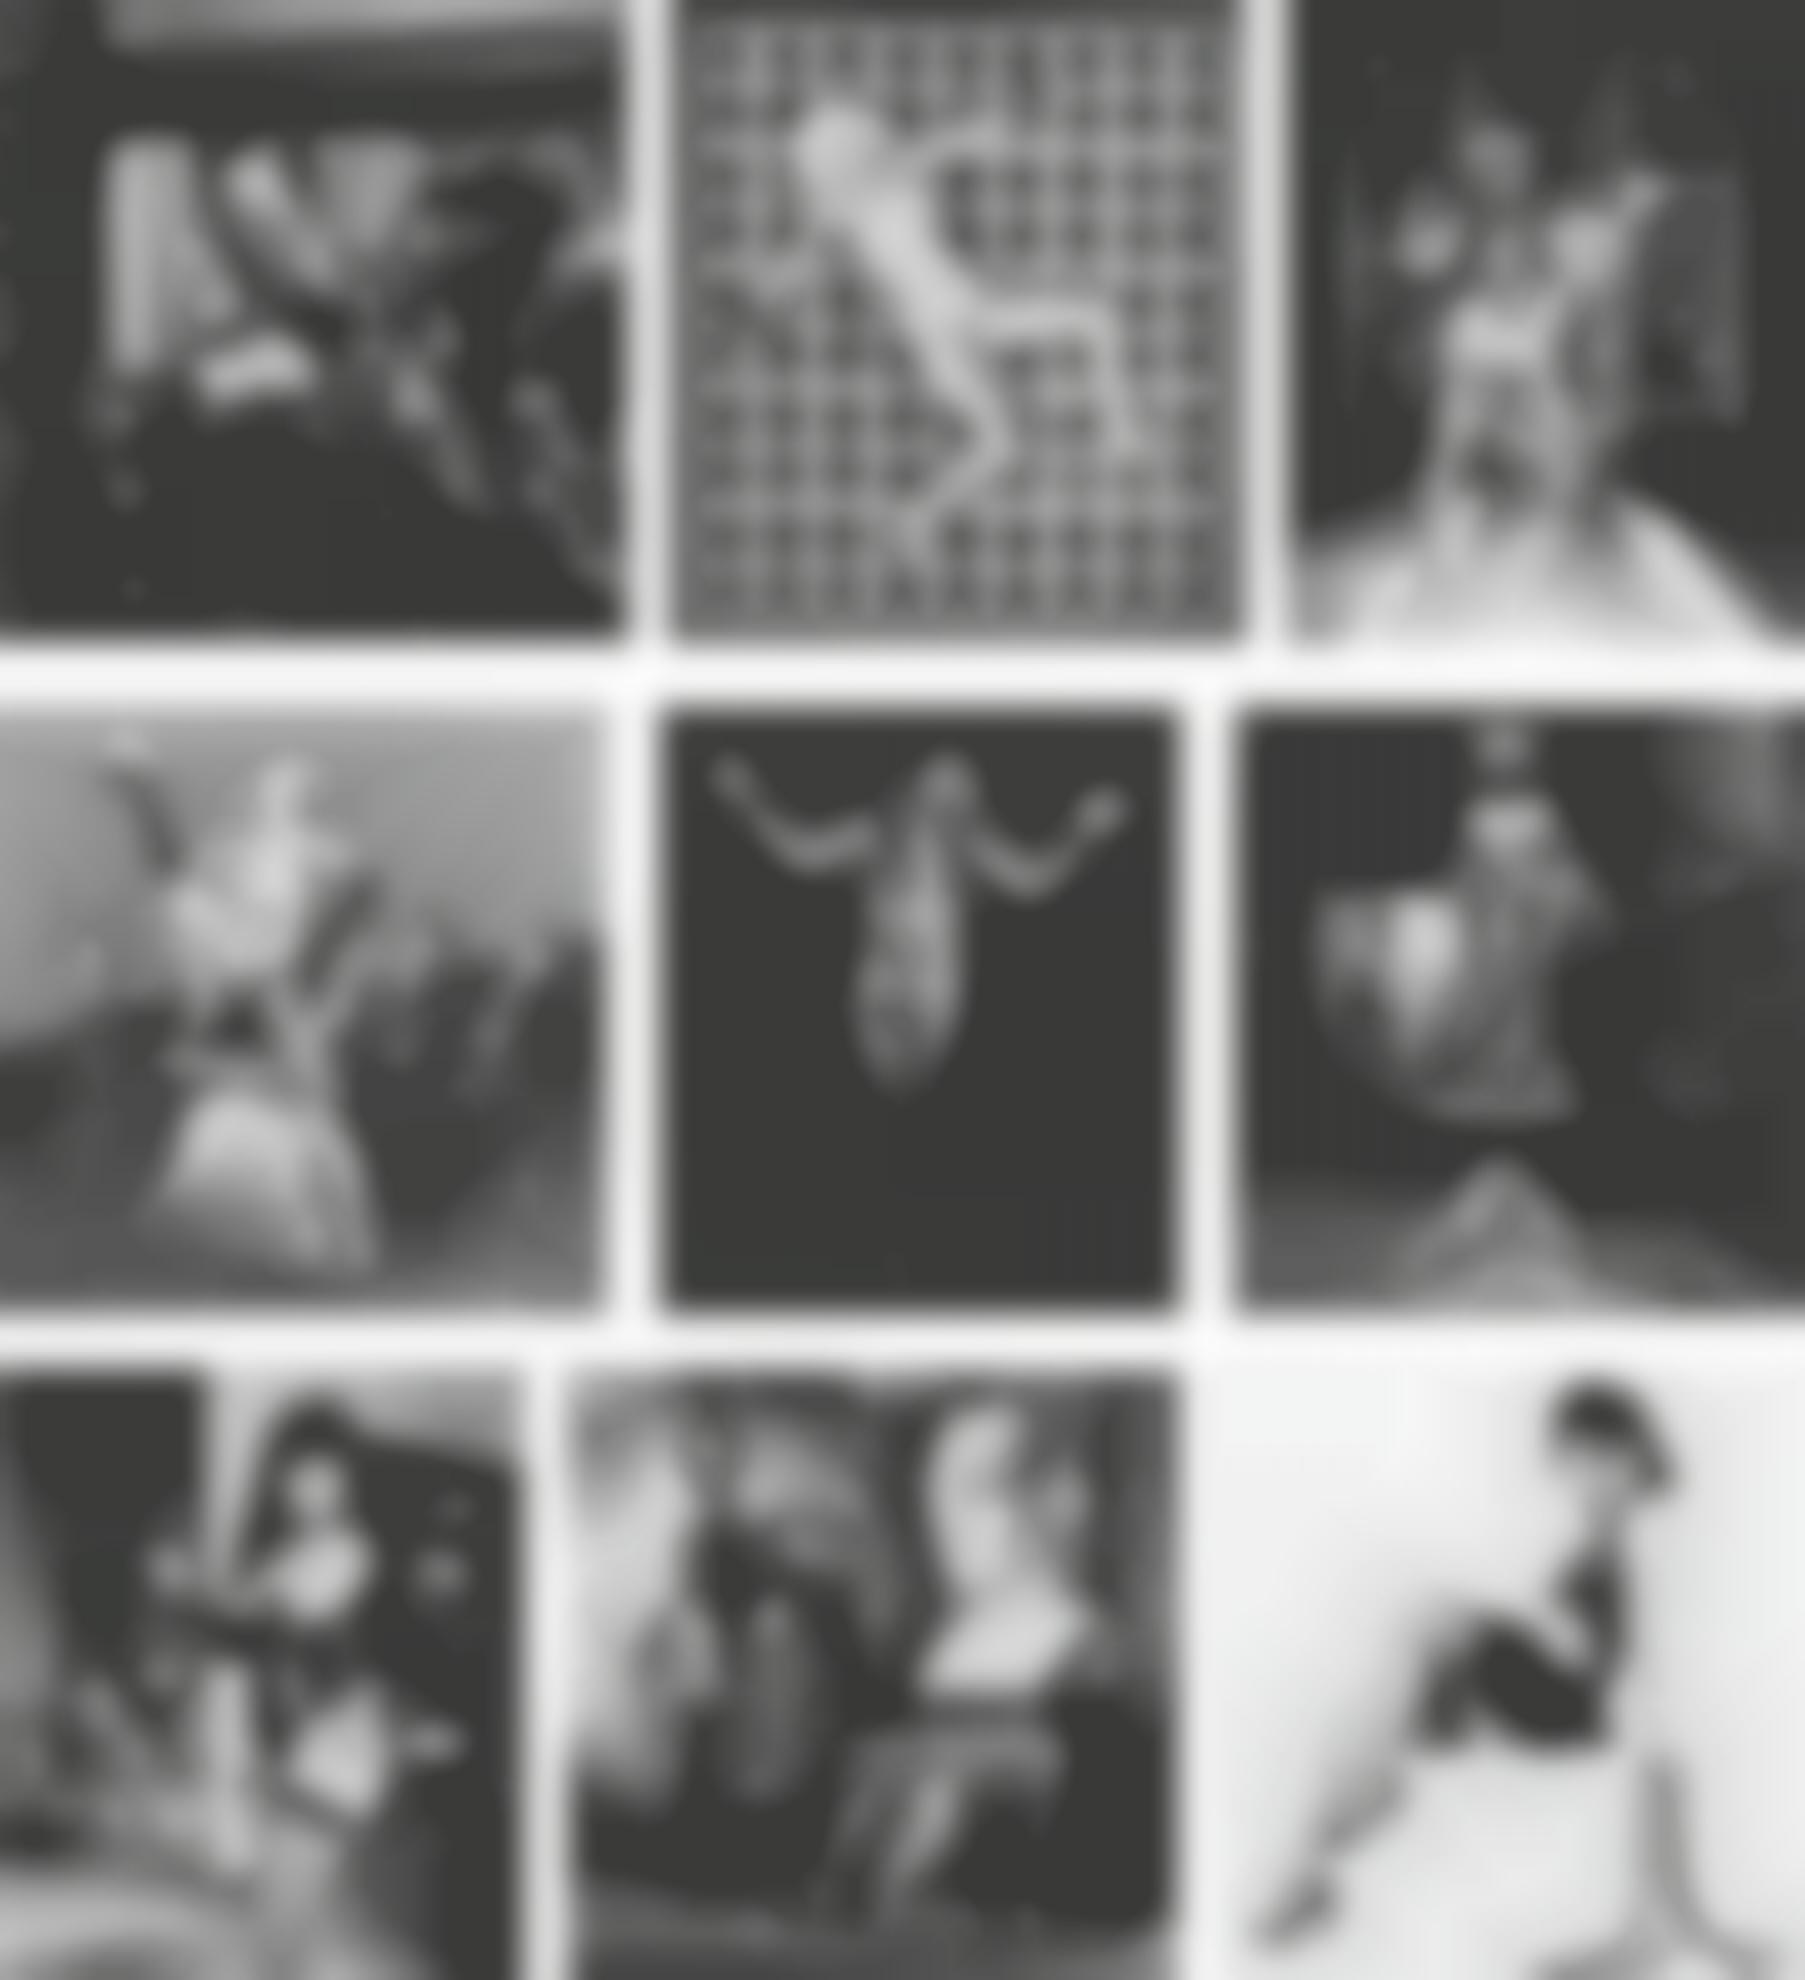 Bob Seidemann - Selected Images From Unspeakable Beauty-2001